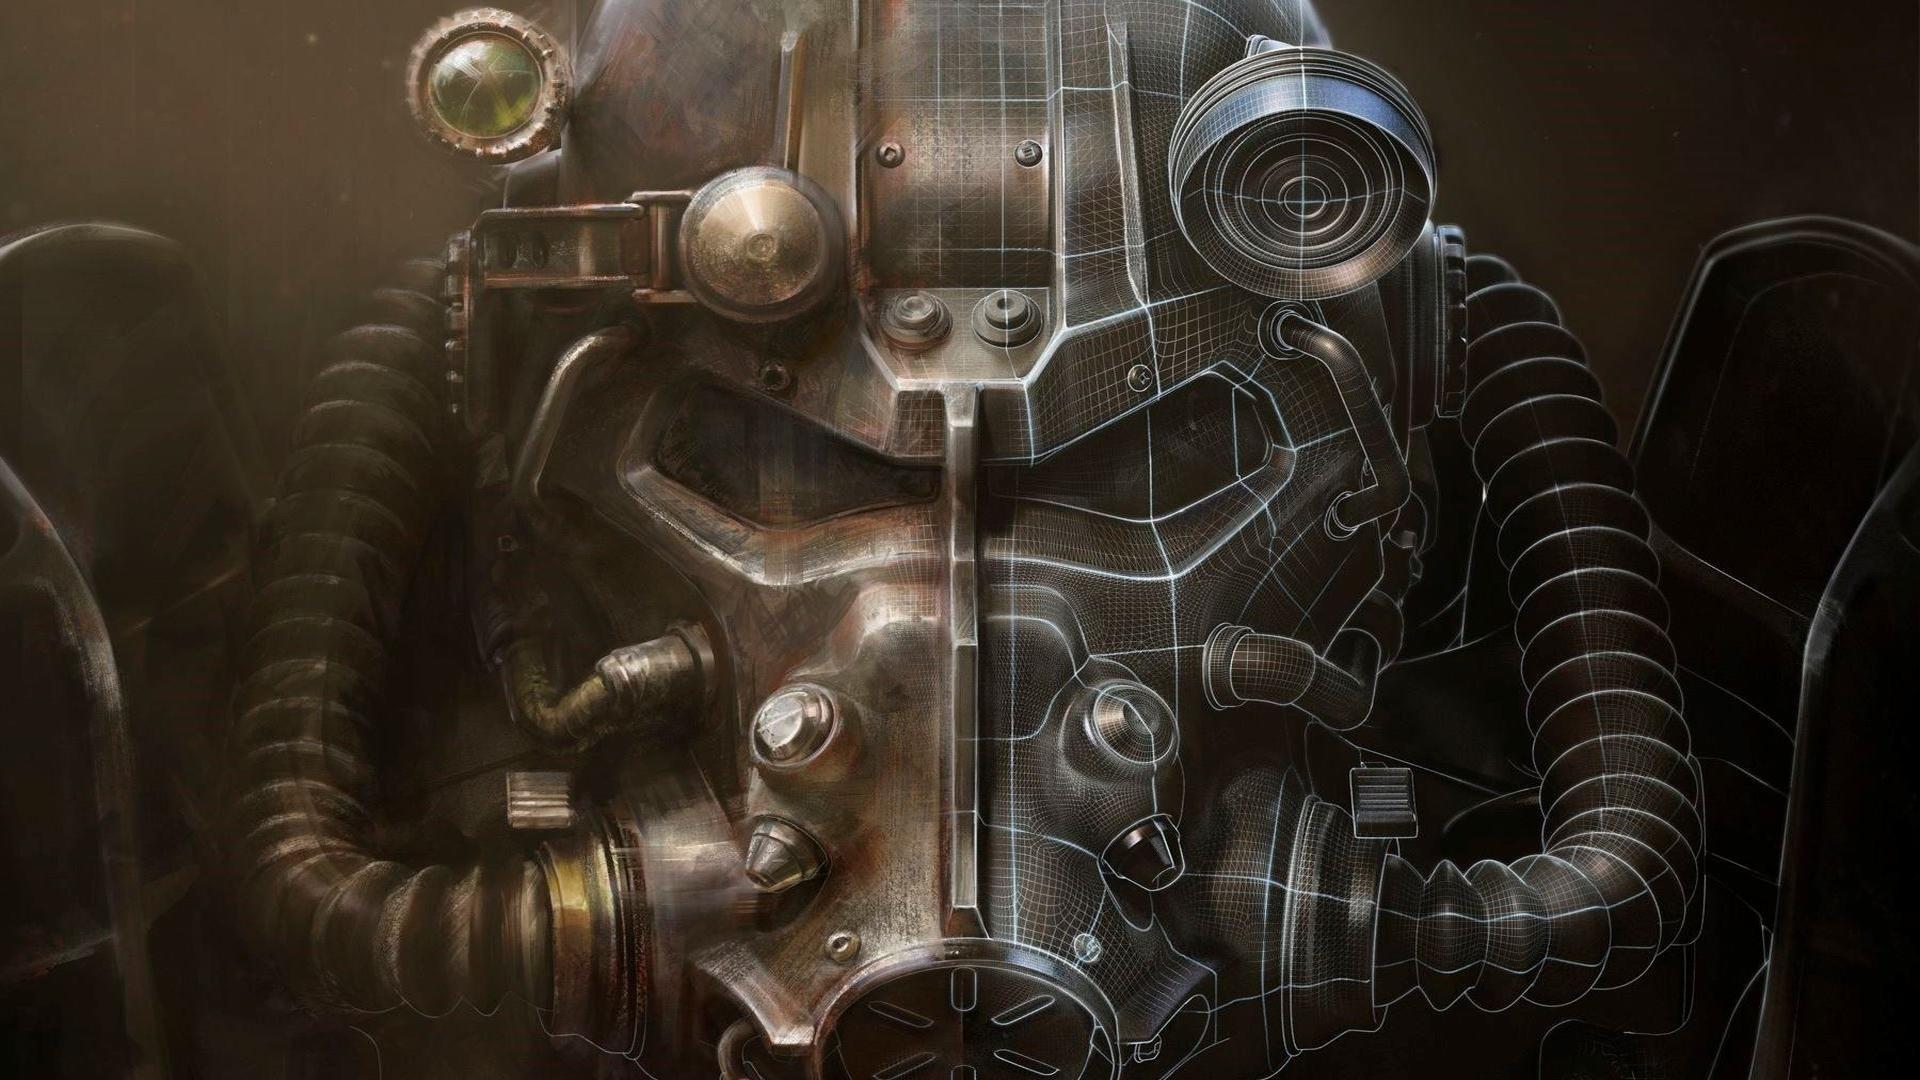 Fallout-wallpaper-wp4006215